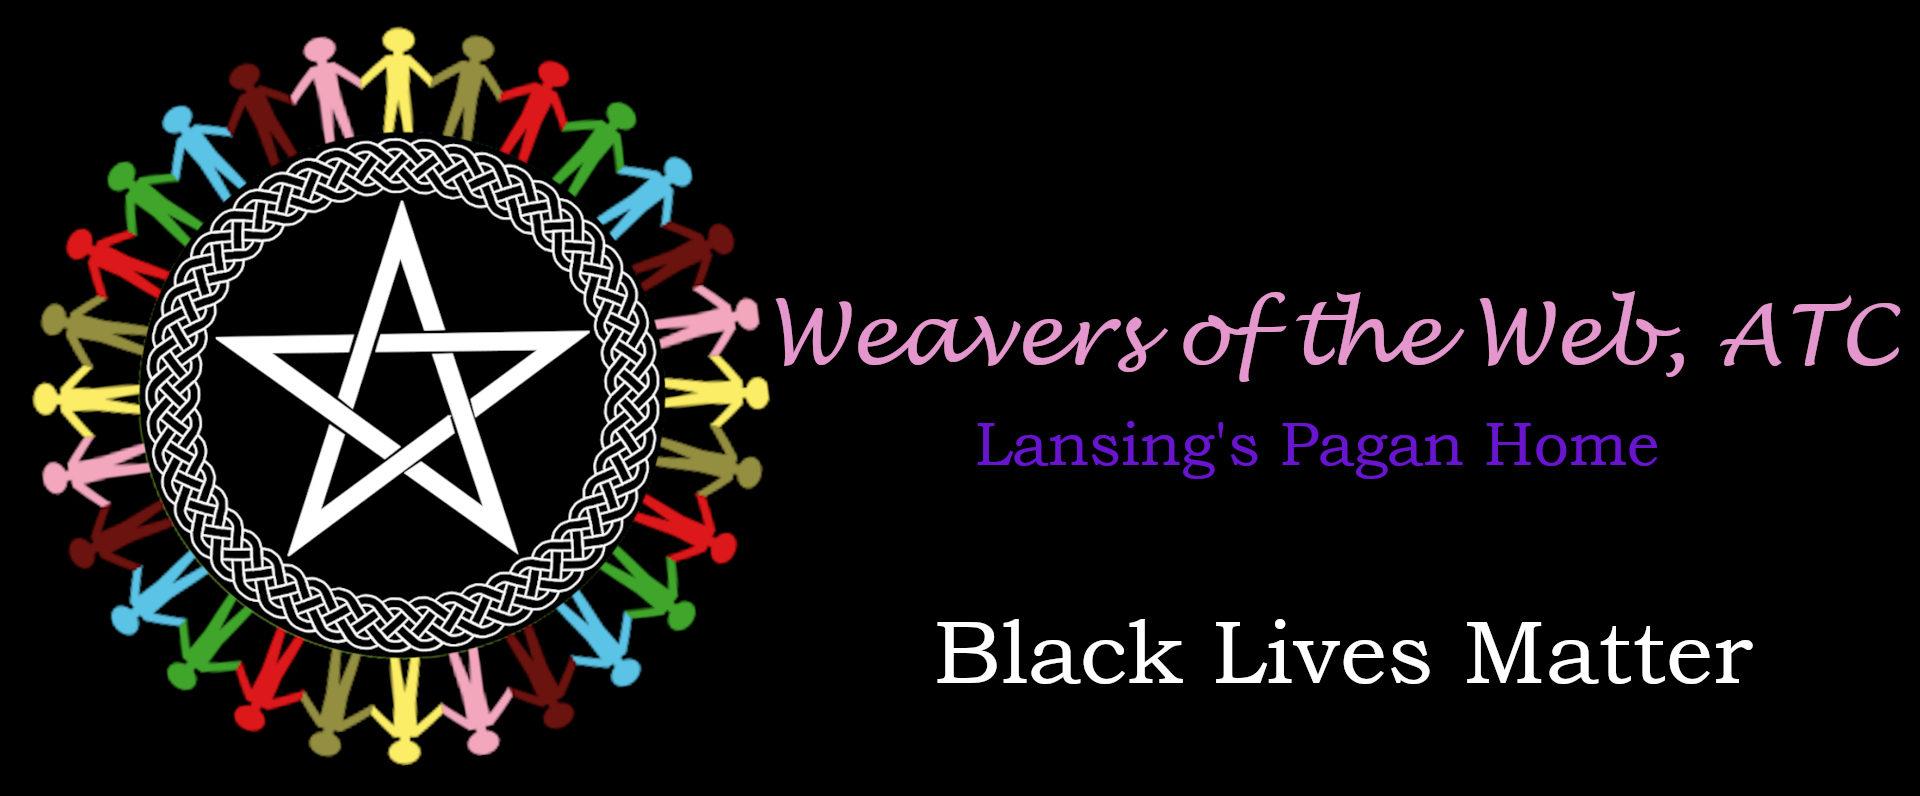 Weavers of the Web, ATC